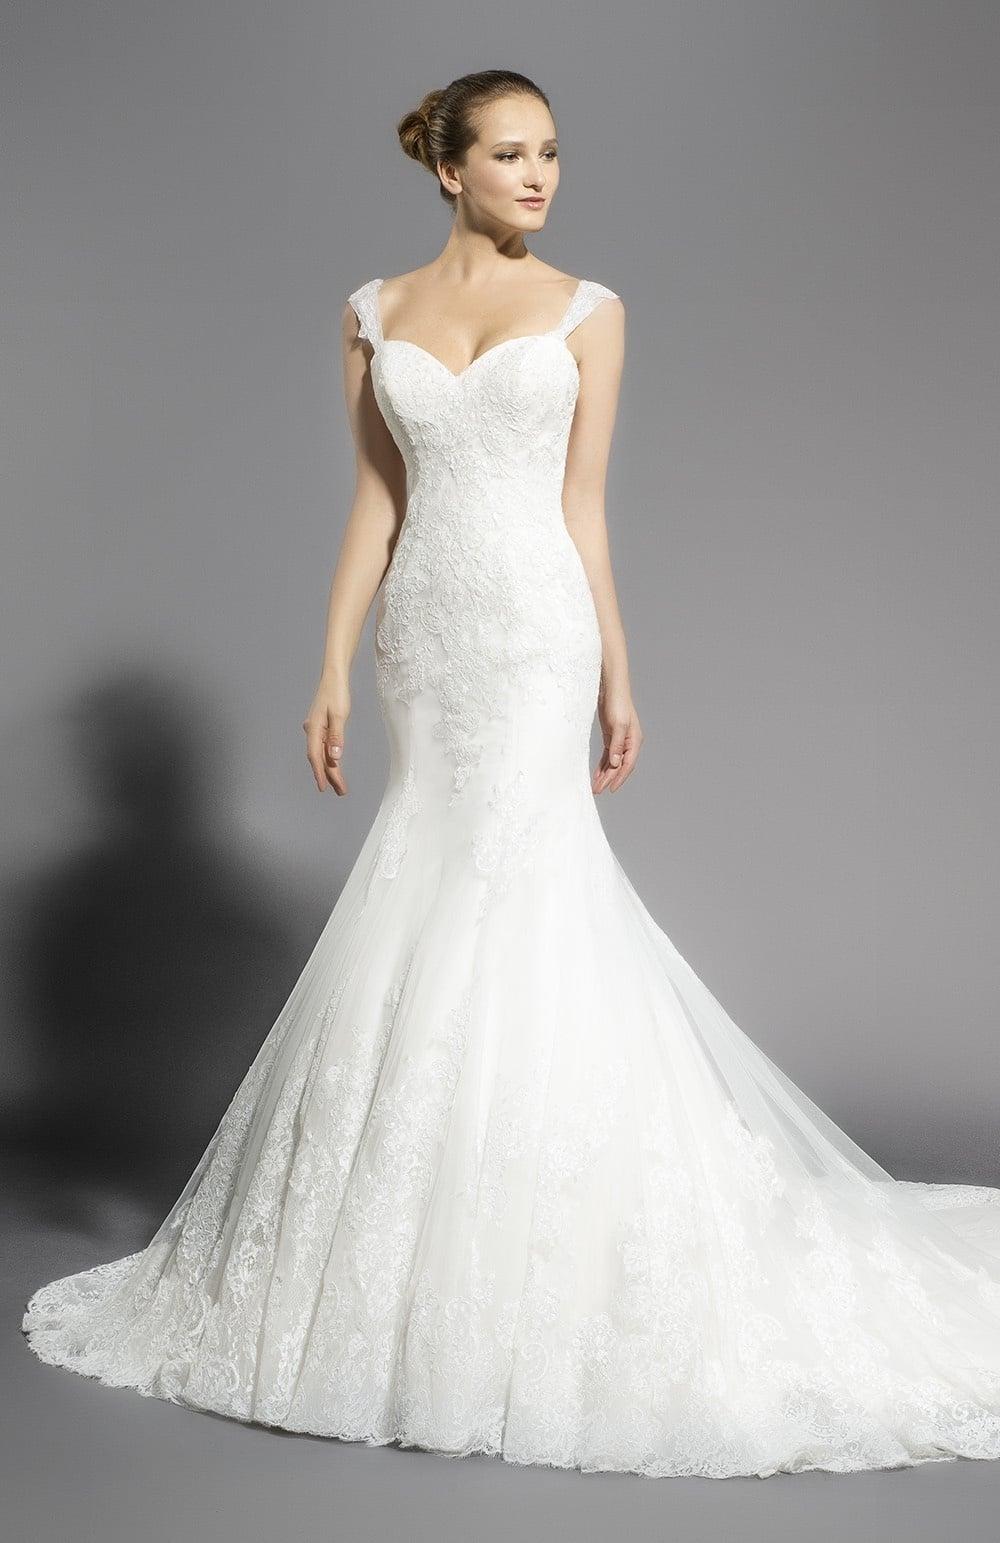 Robe de mariée Modèle Pandora